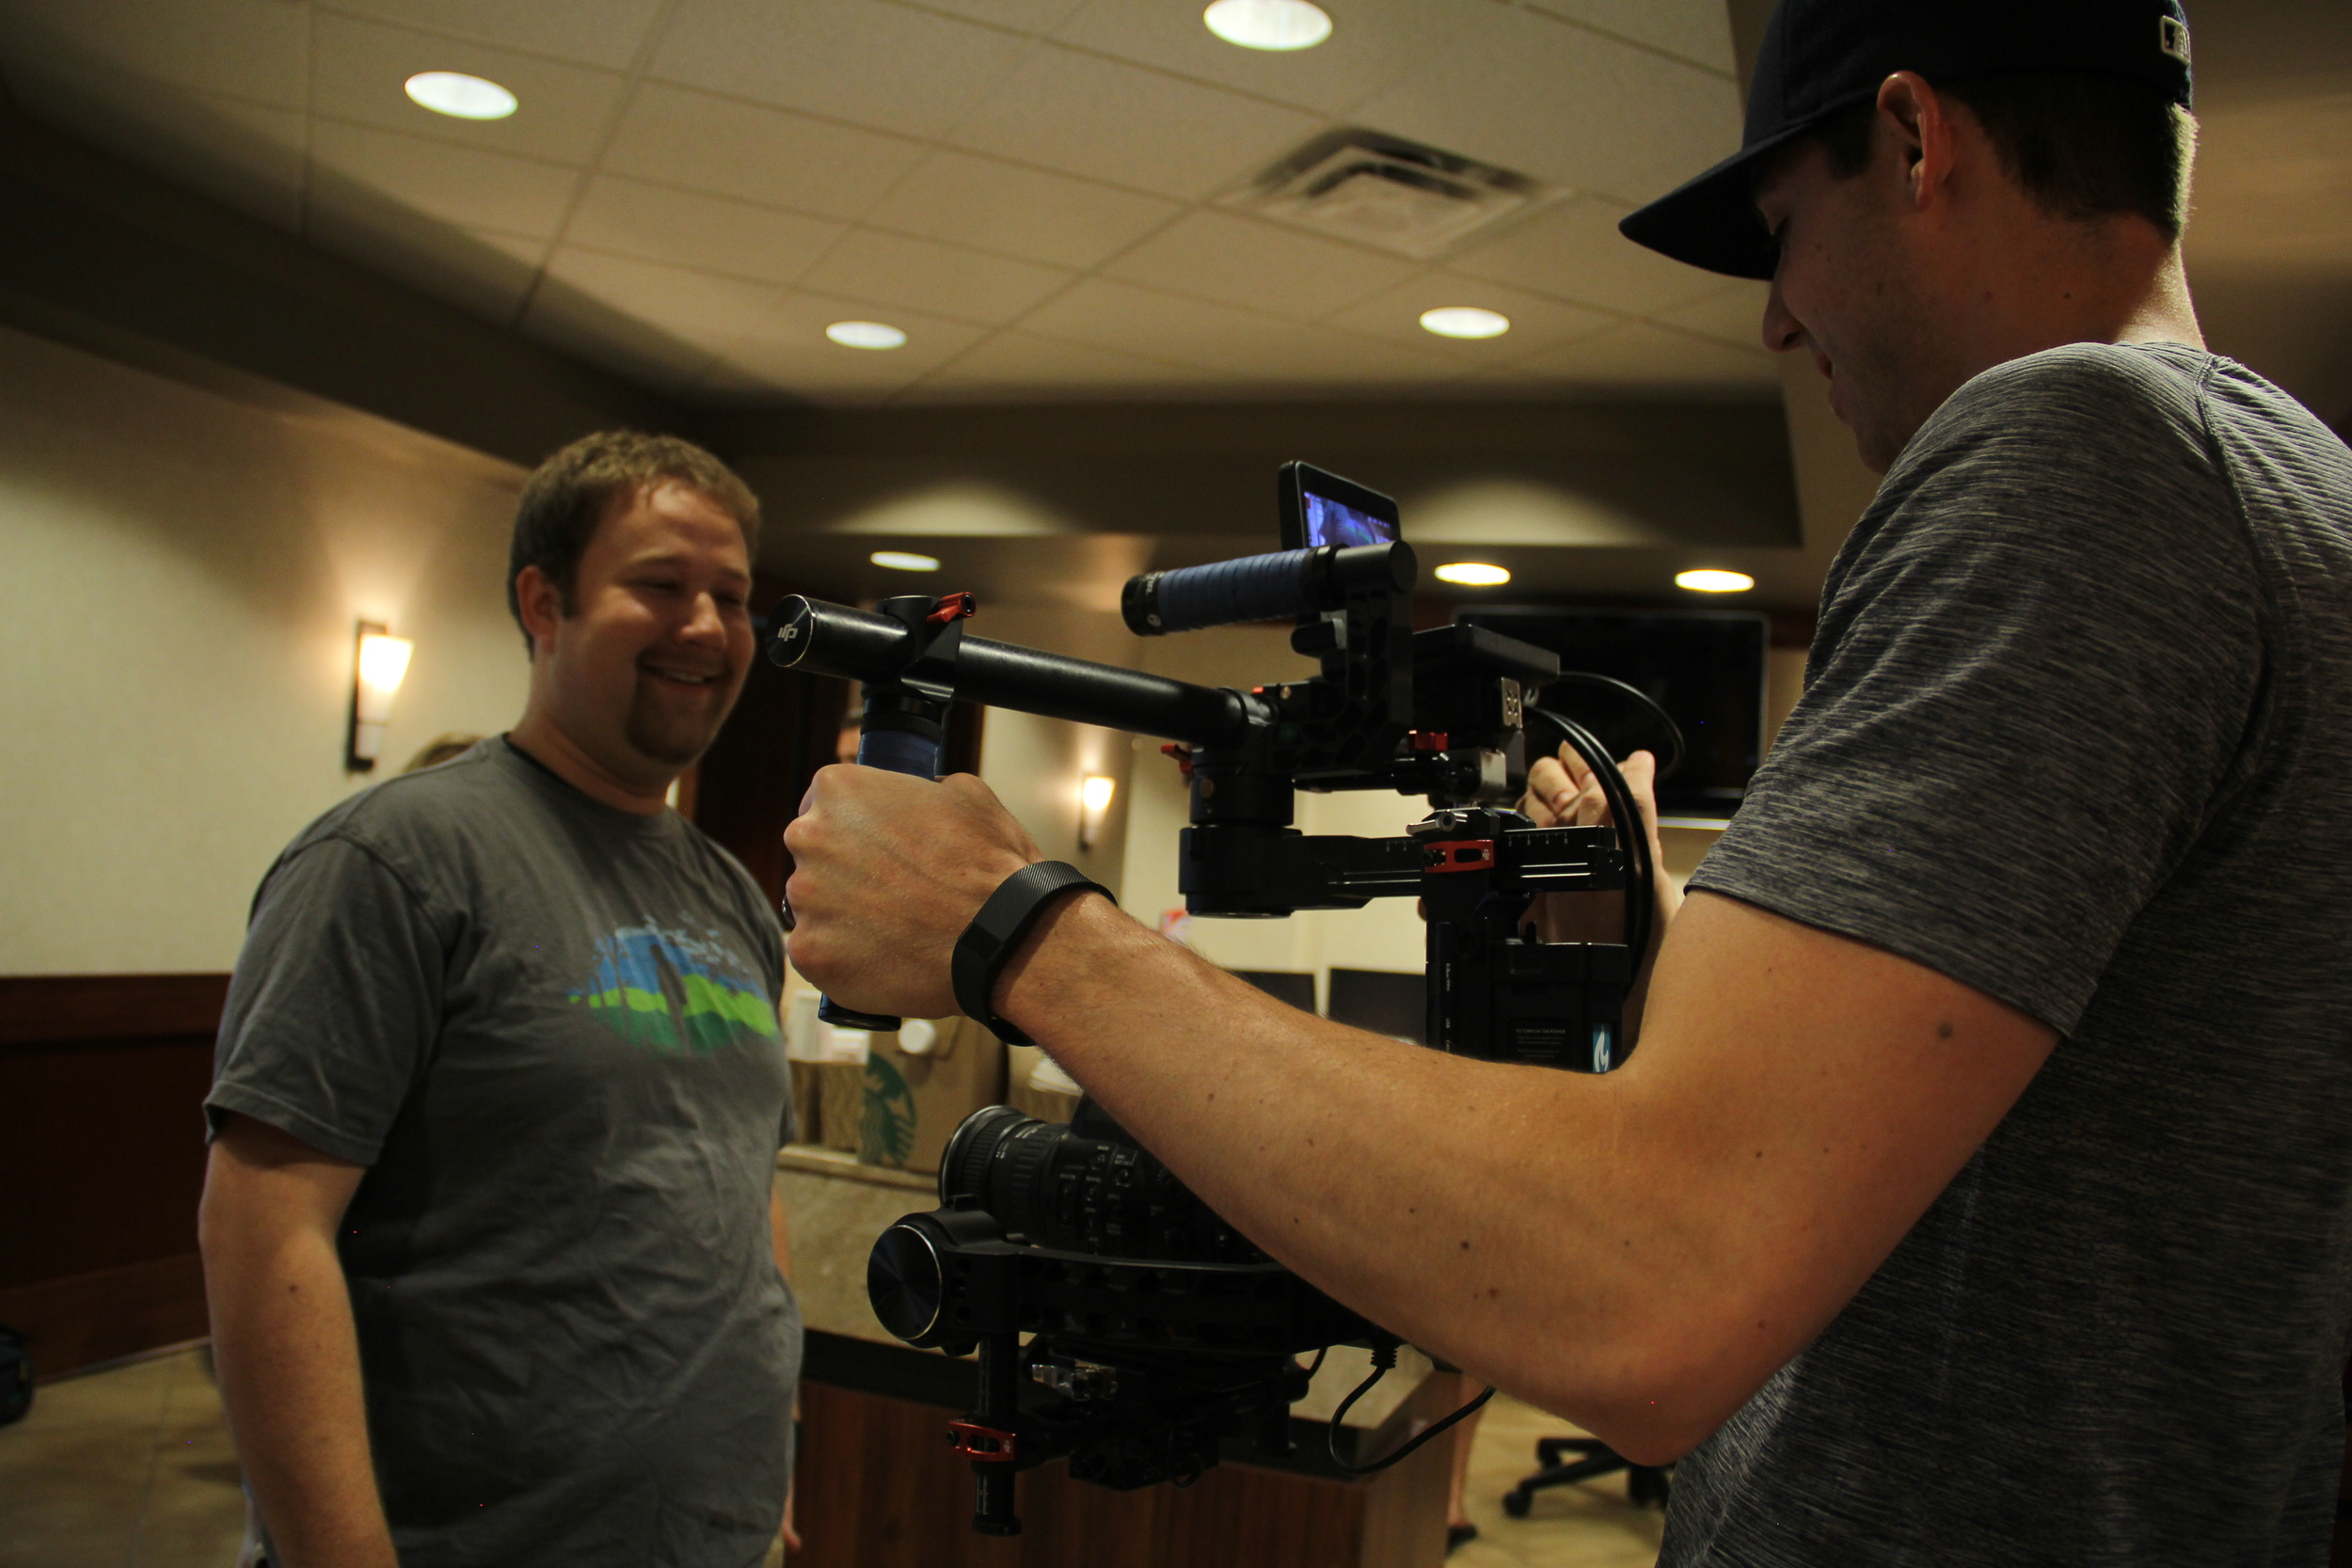 Alex Docekal (Producer) & Mike Rohlfing (Producer/DP) prepare the DJI Ronin